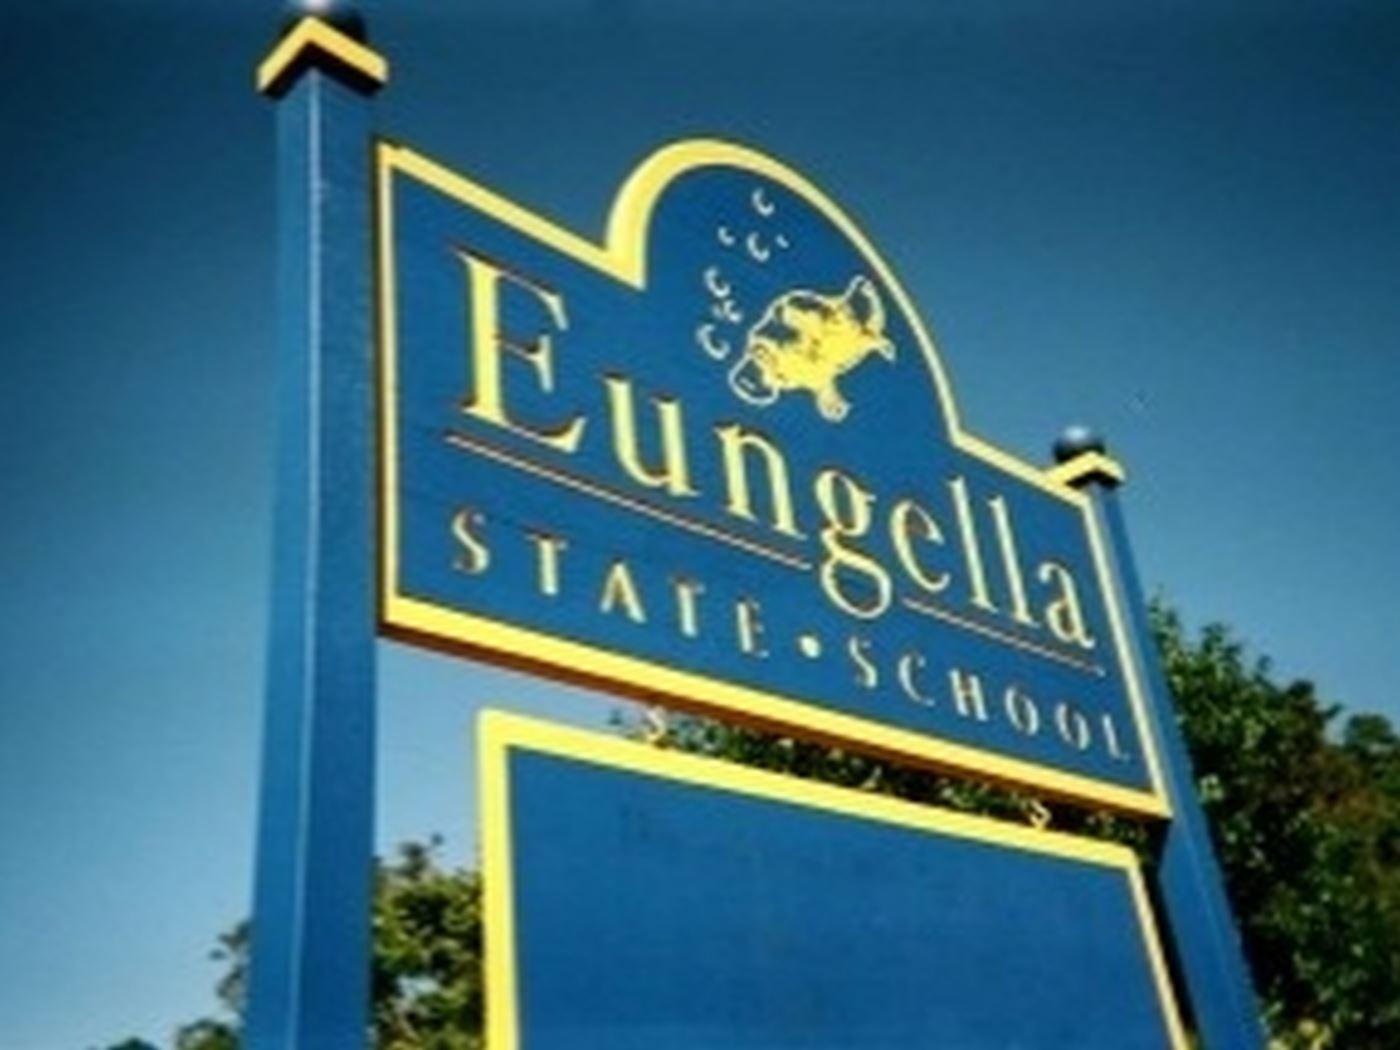 Eungella State Primary School